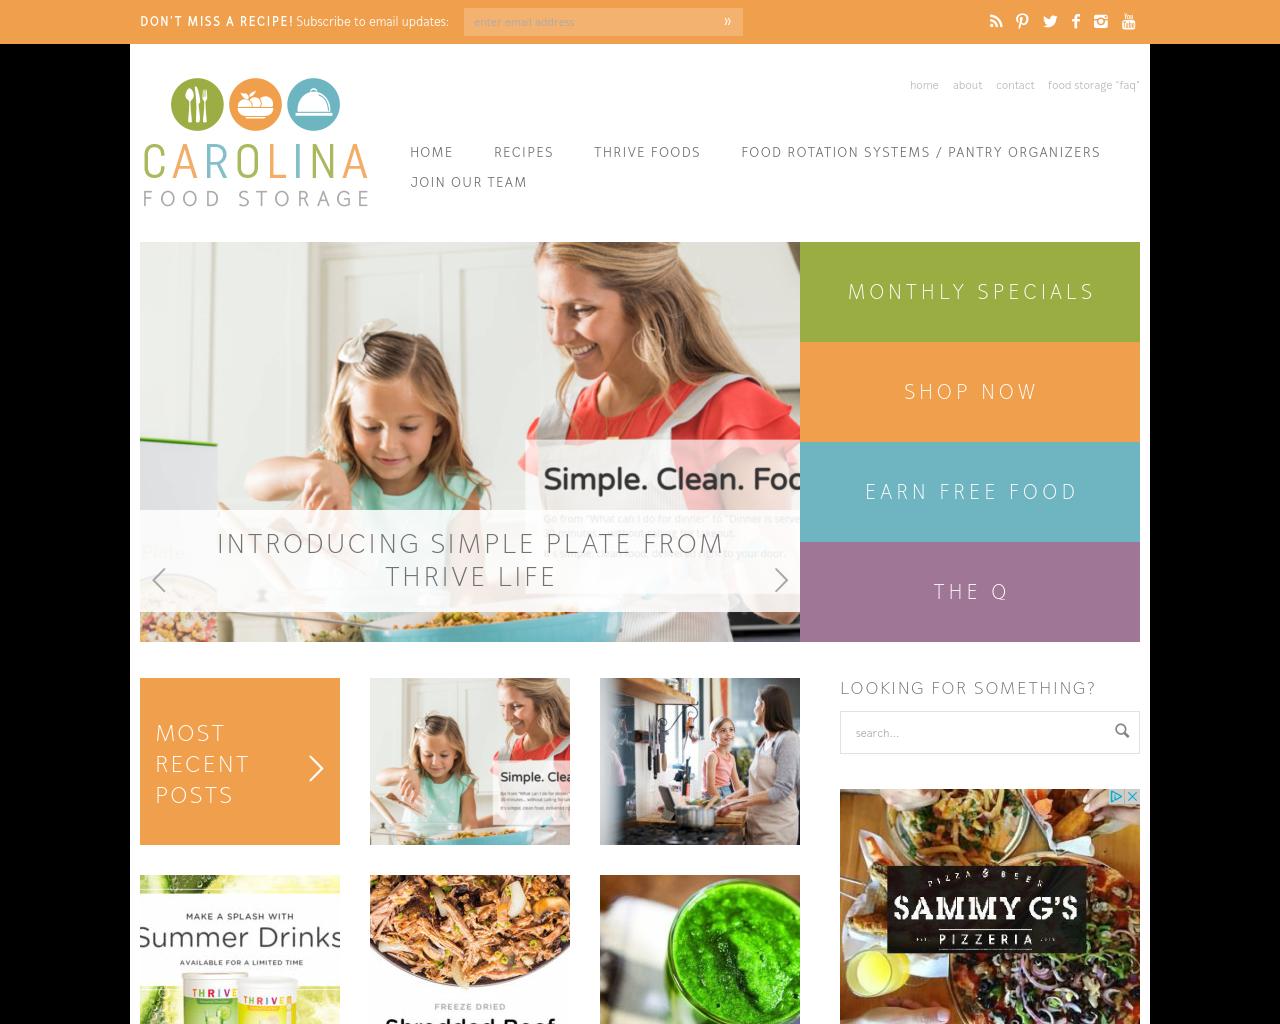 Carolina-Food-Storage-Advertising-Reviews-Pricing